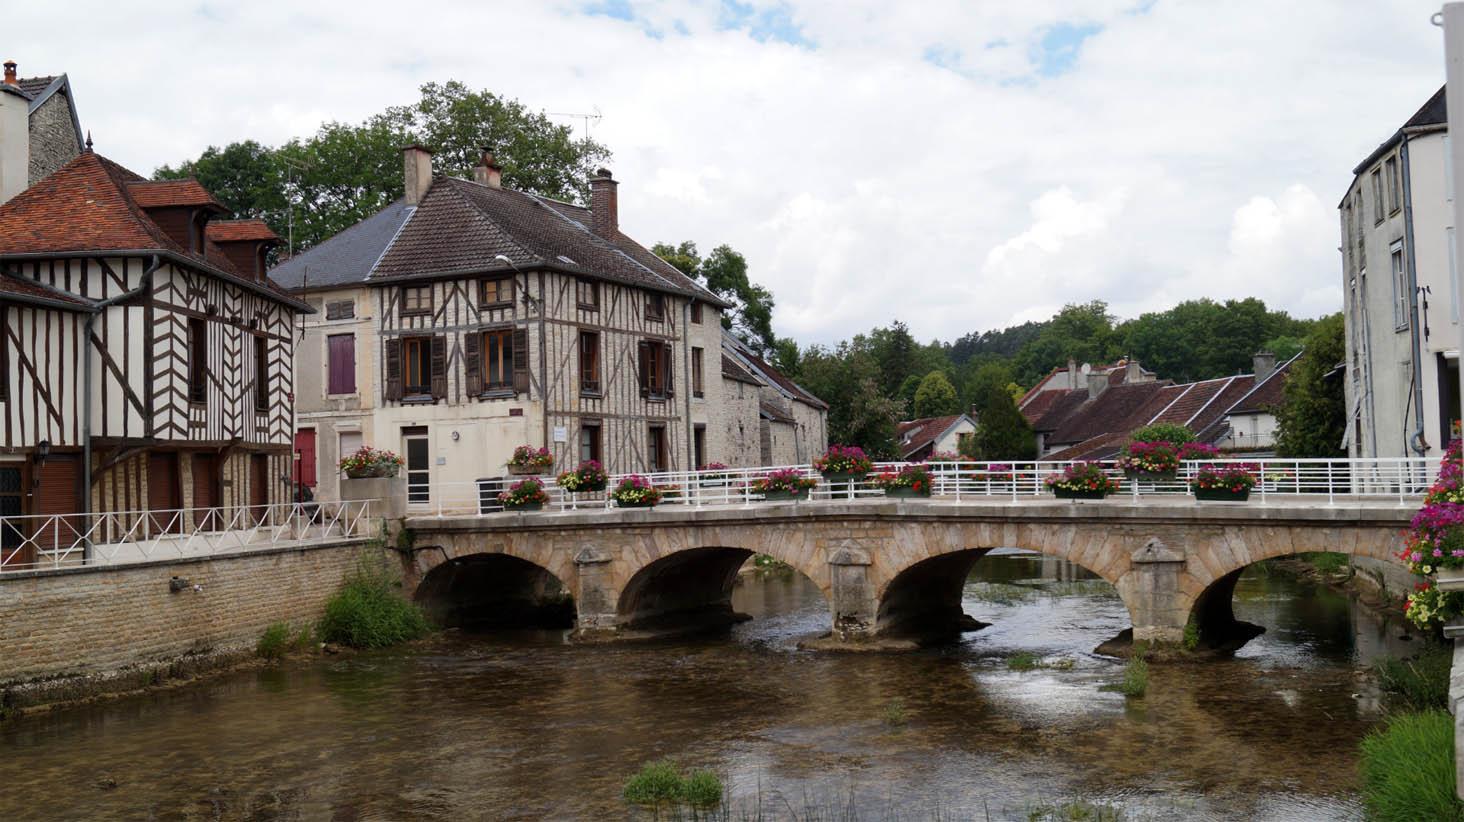 Essoyes (France)